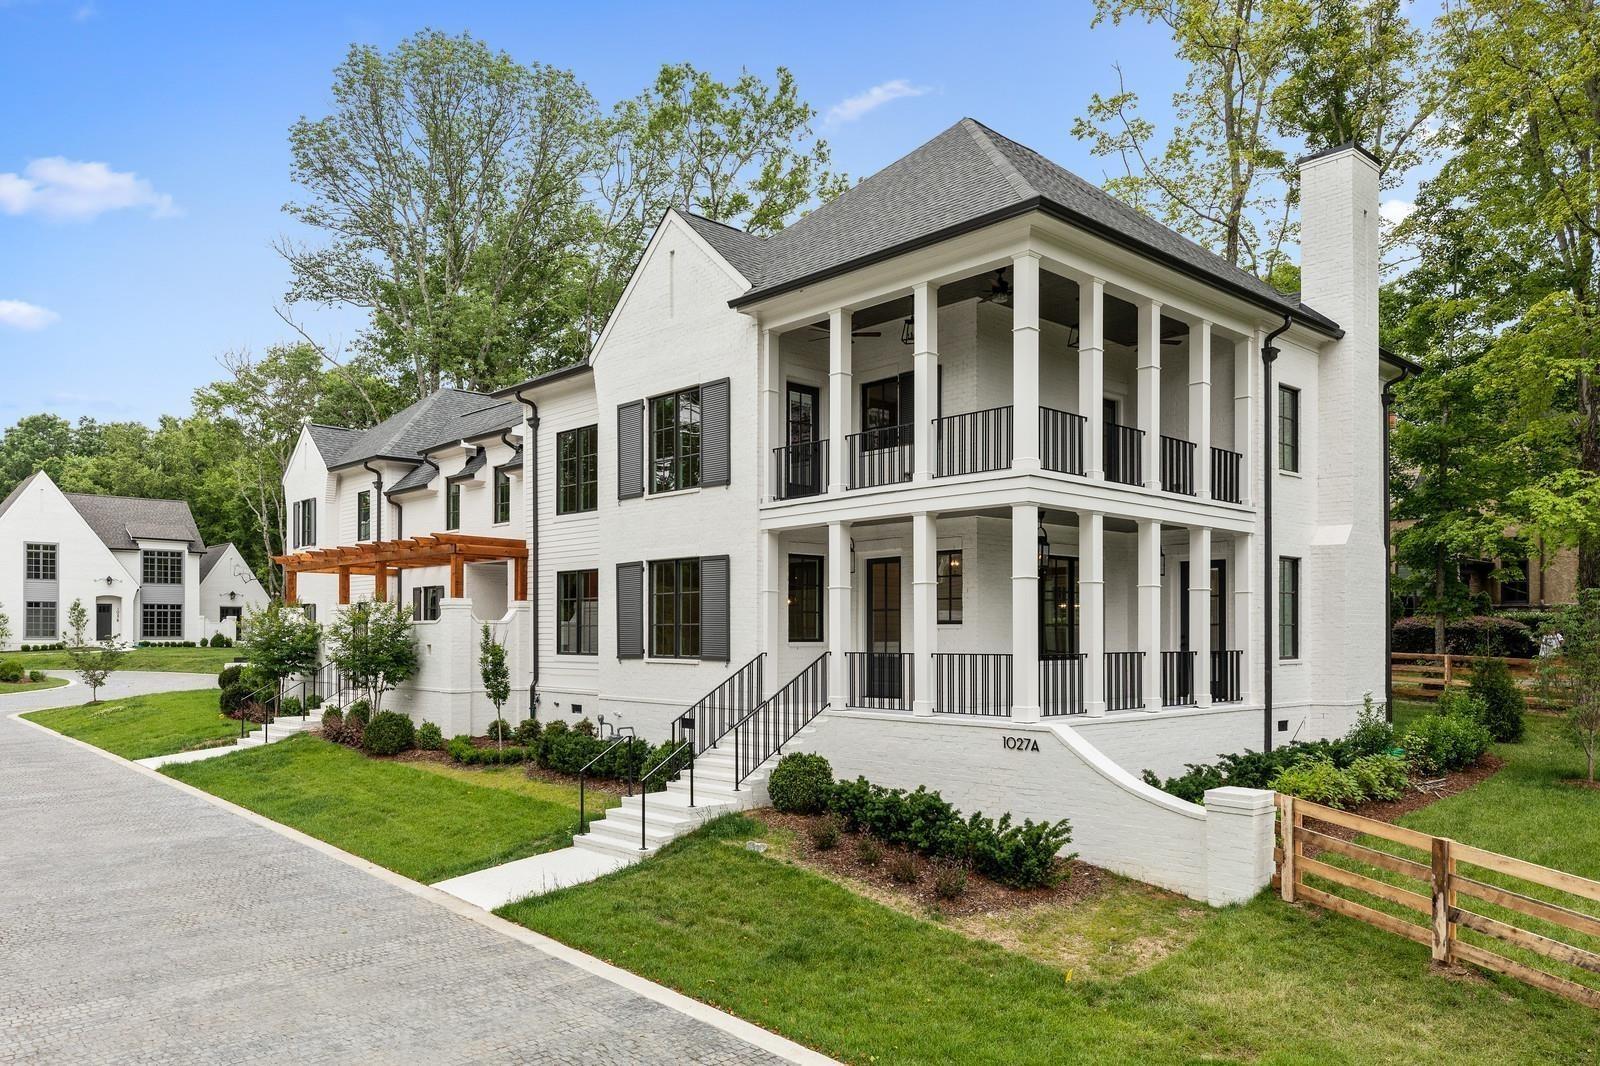 1027A Battery Lane Property Photo - Nashville, TN real estate listing